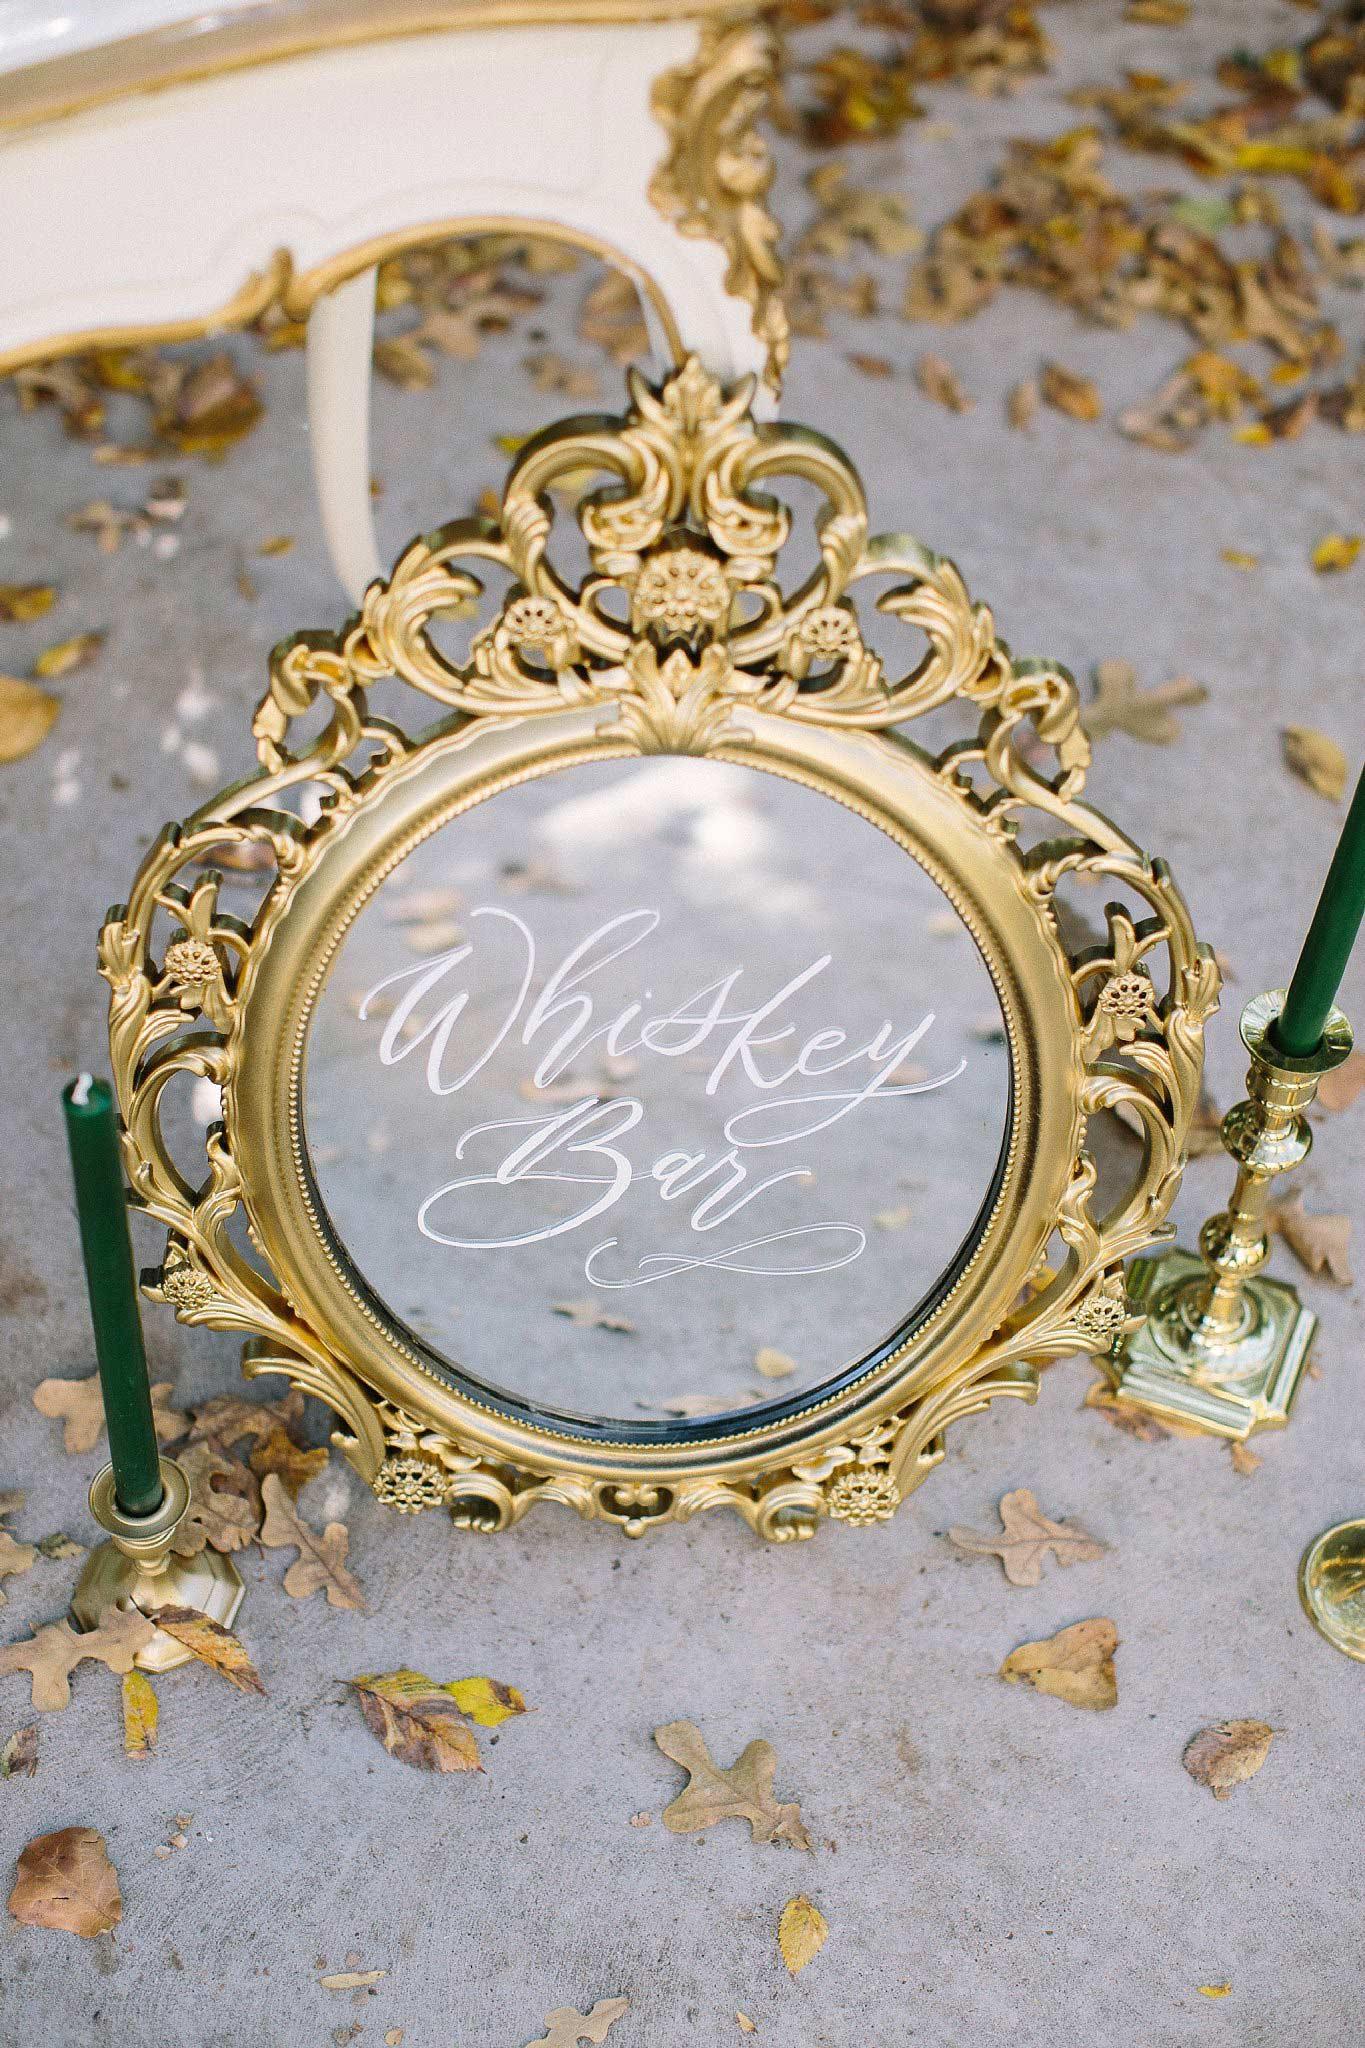 aristide mansfield wedding whiskey bar mirror sign